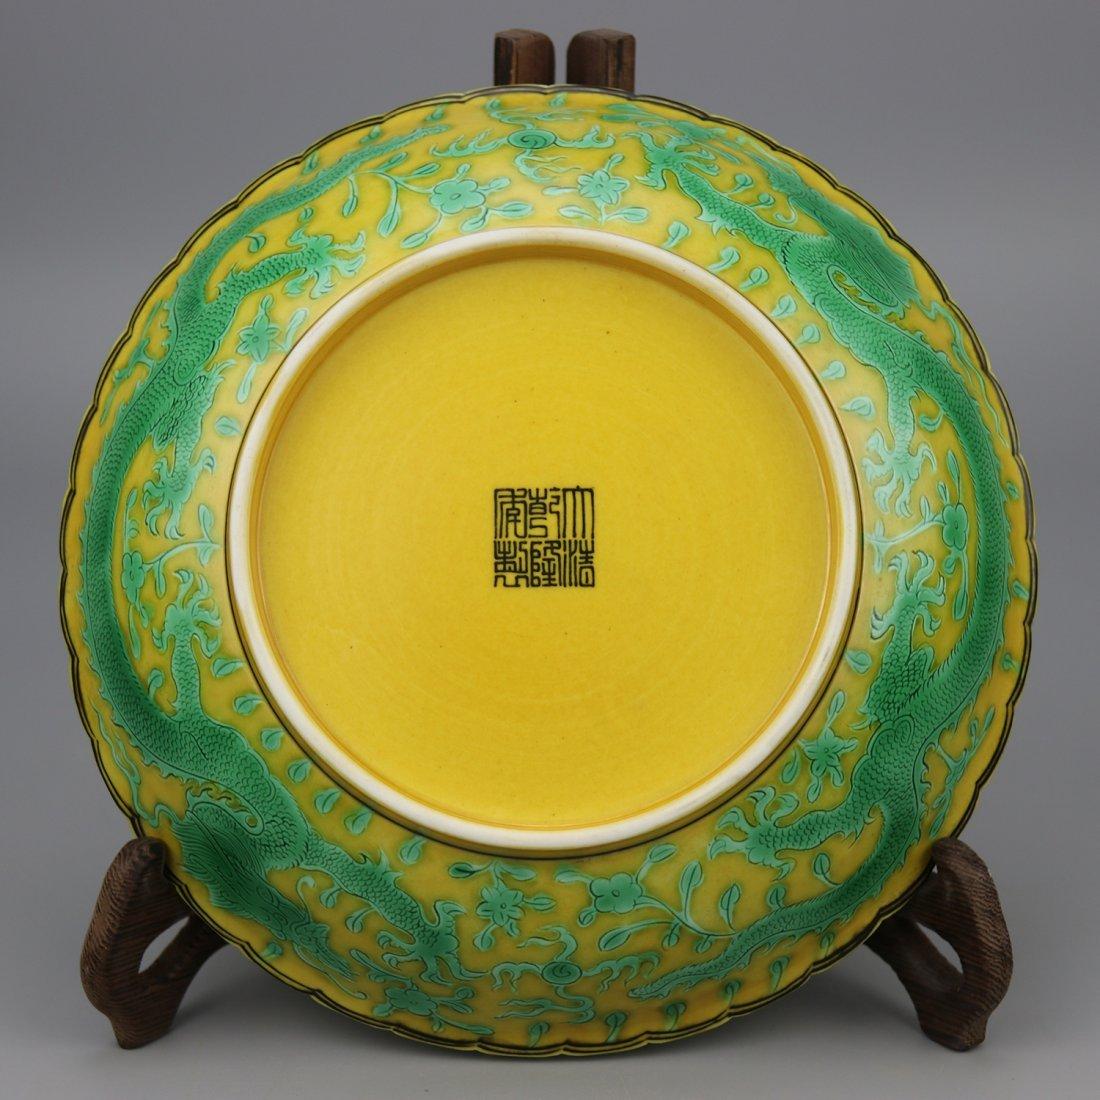 Chinese Yellow glaze green dragon Porcelain Plate - 3